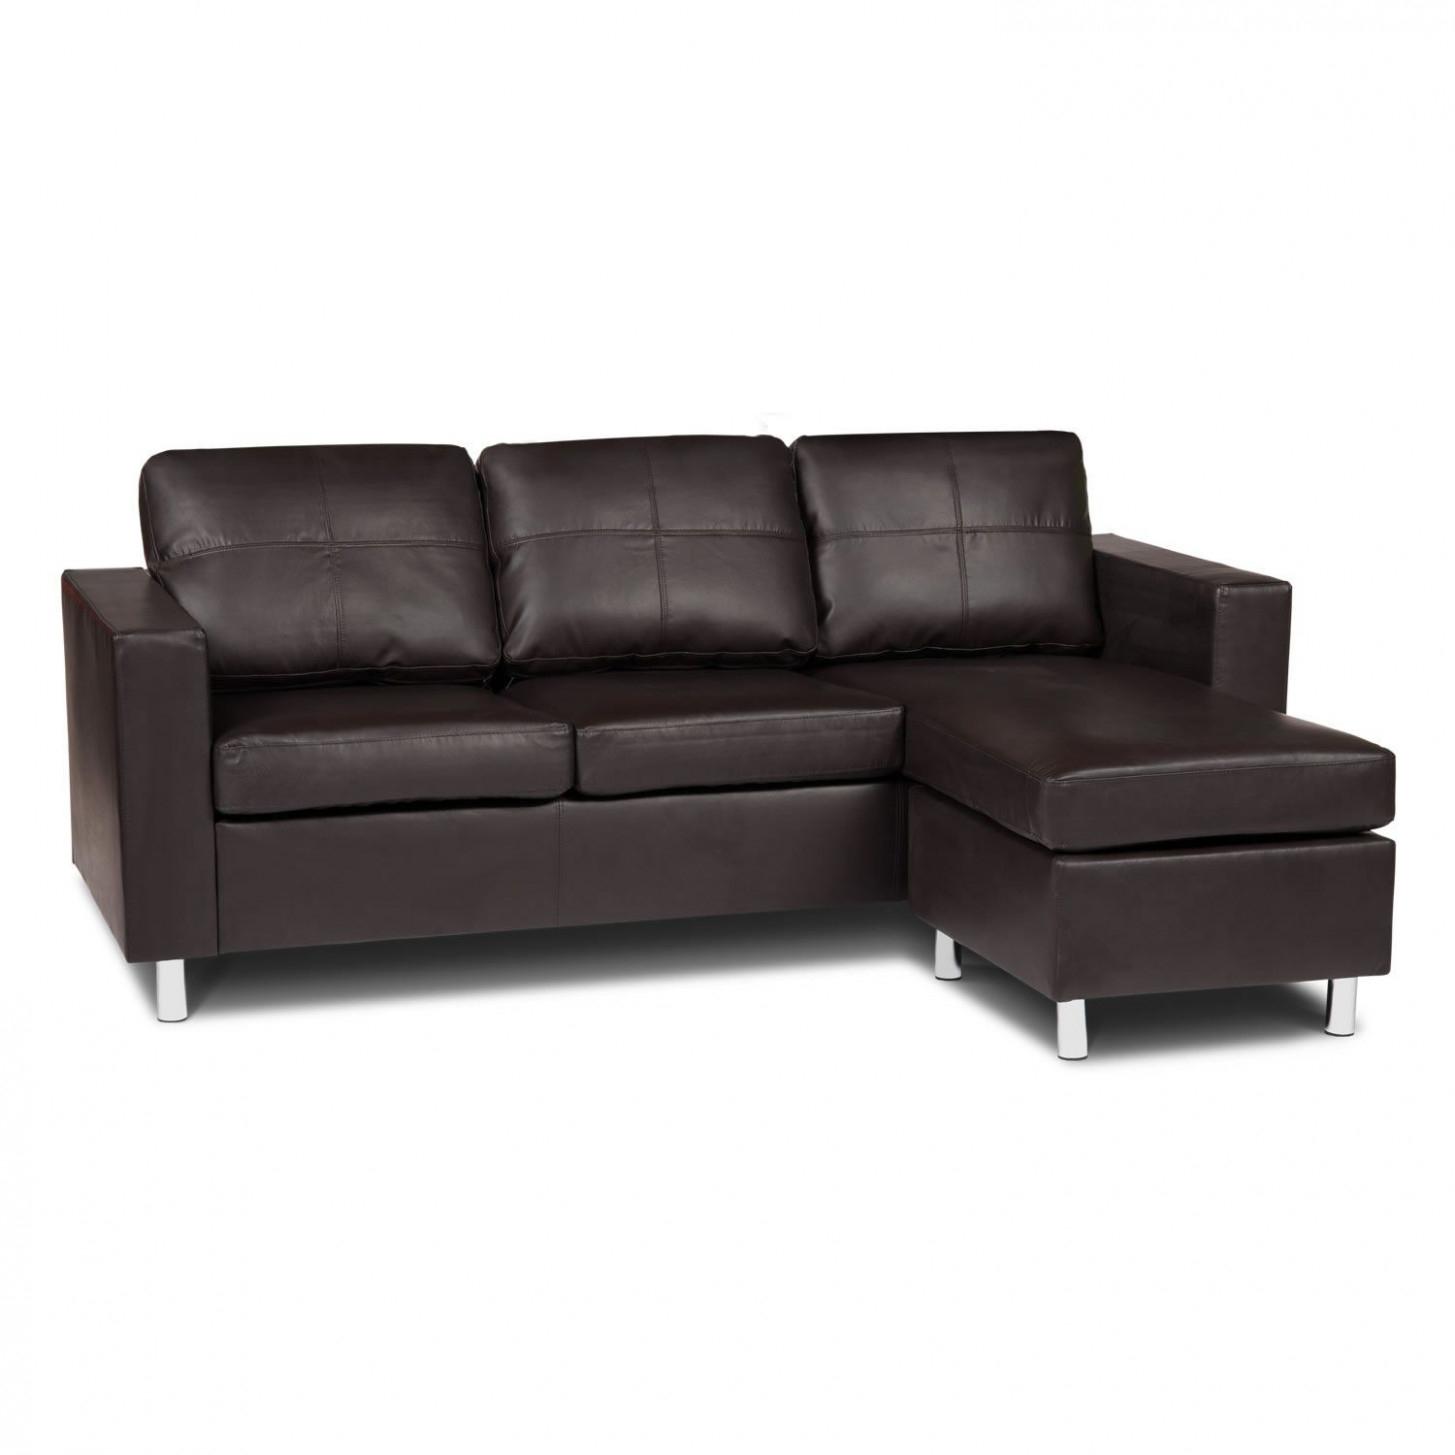 9 Leather Corner Sofa Quick Delivery   Home Design Regarding Leather Corner Sofas (View 8 of 15)